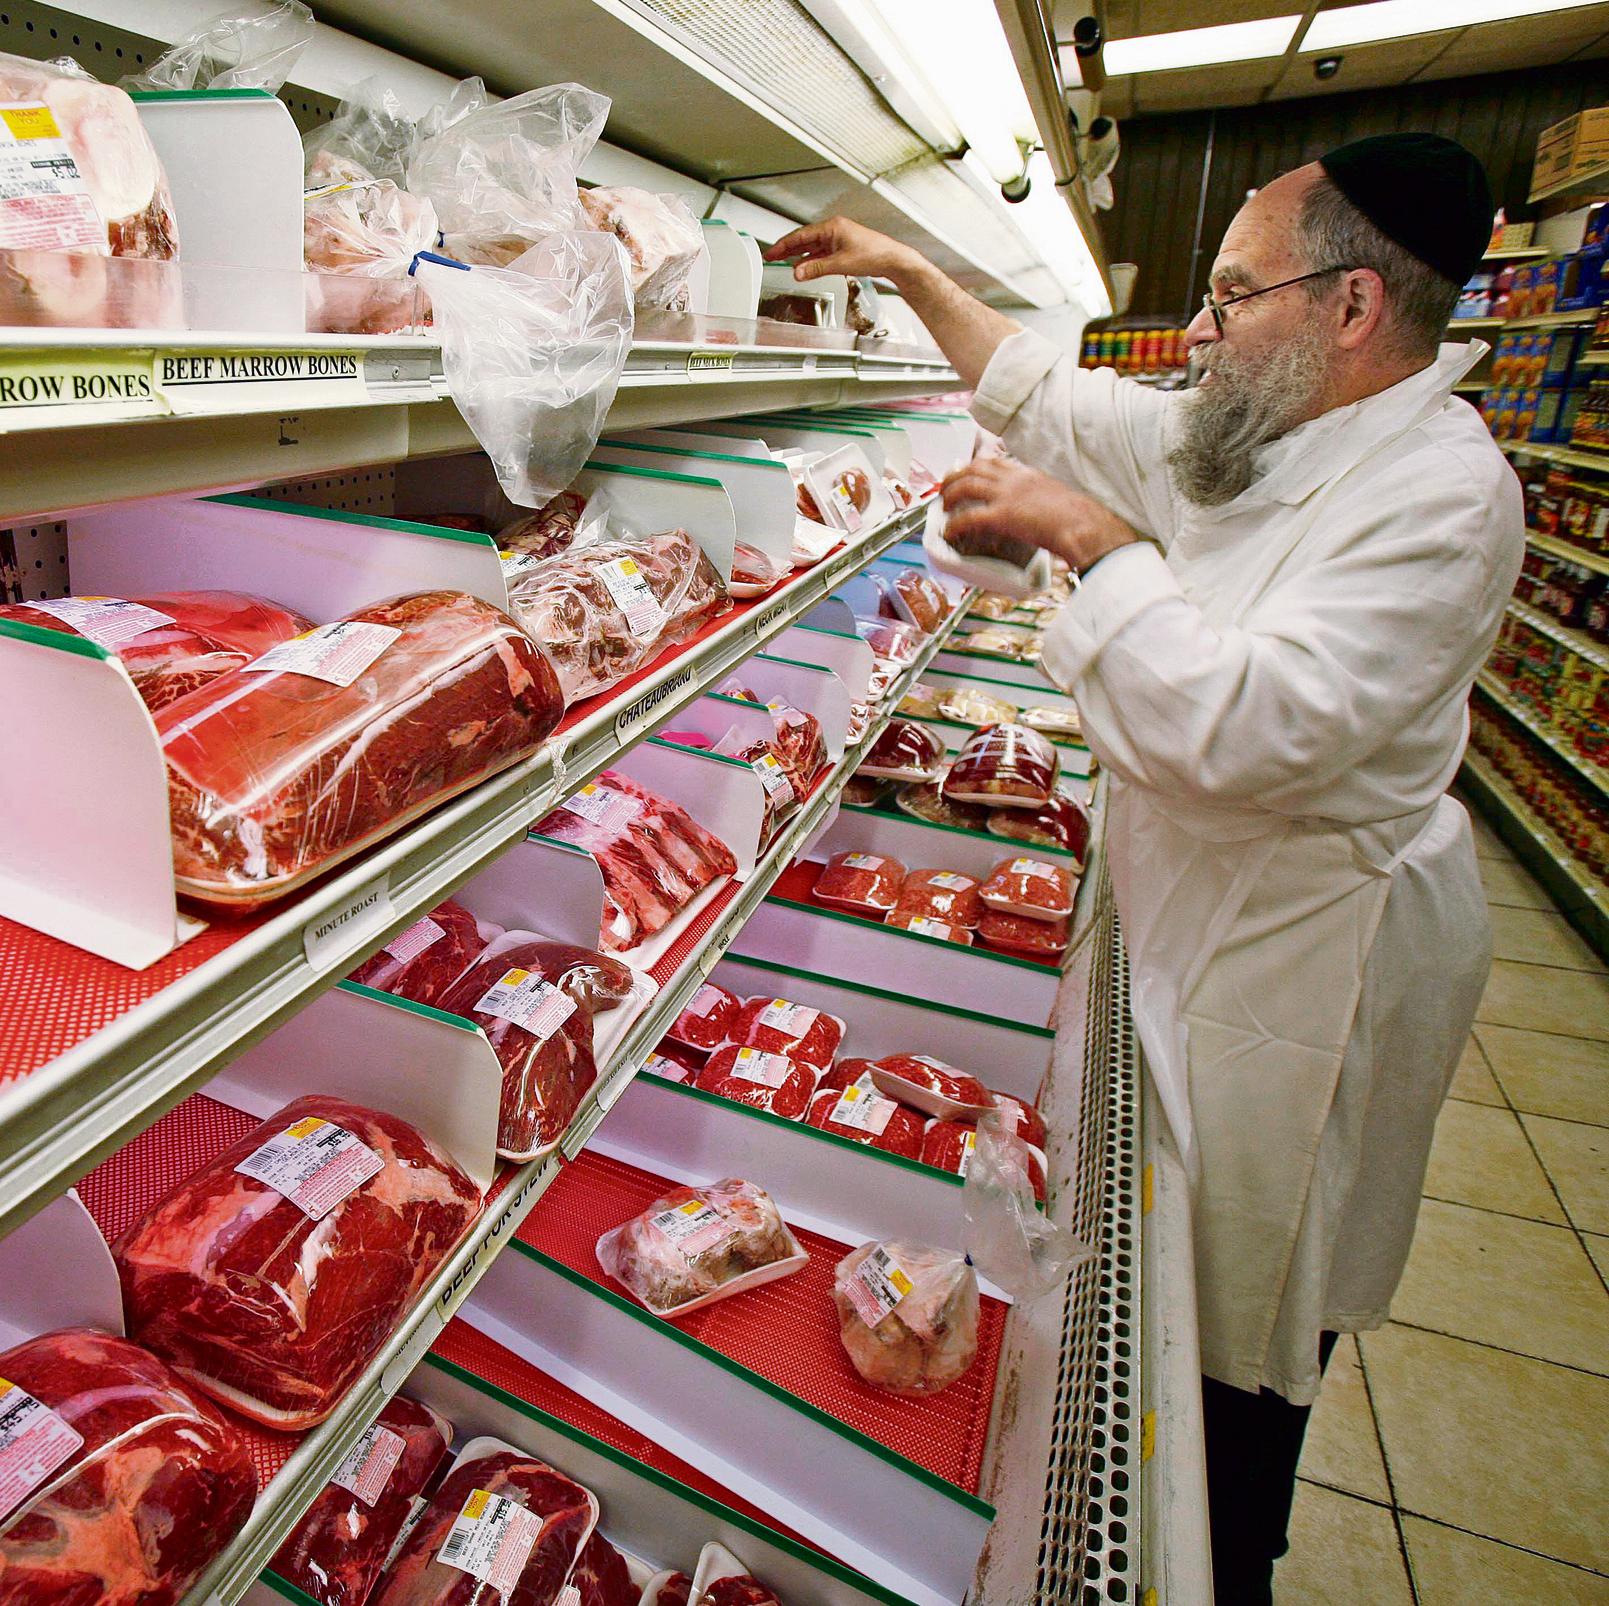 Kosher meat in Europe (Photo: AP)